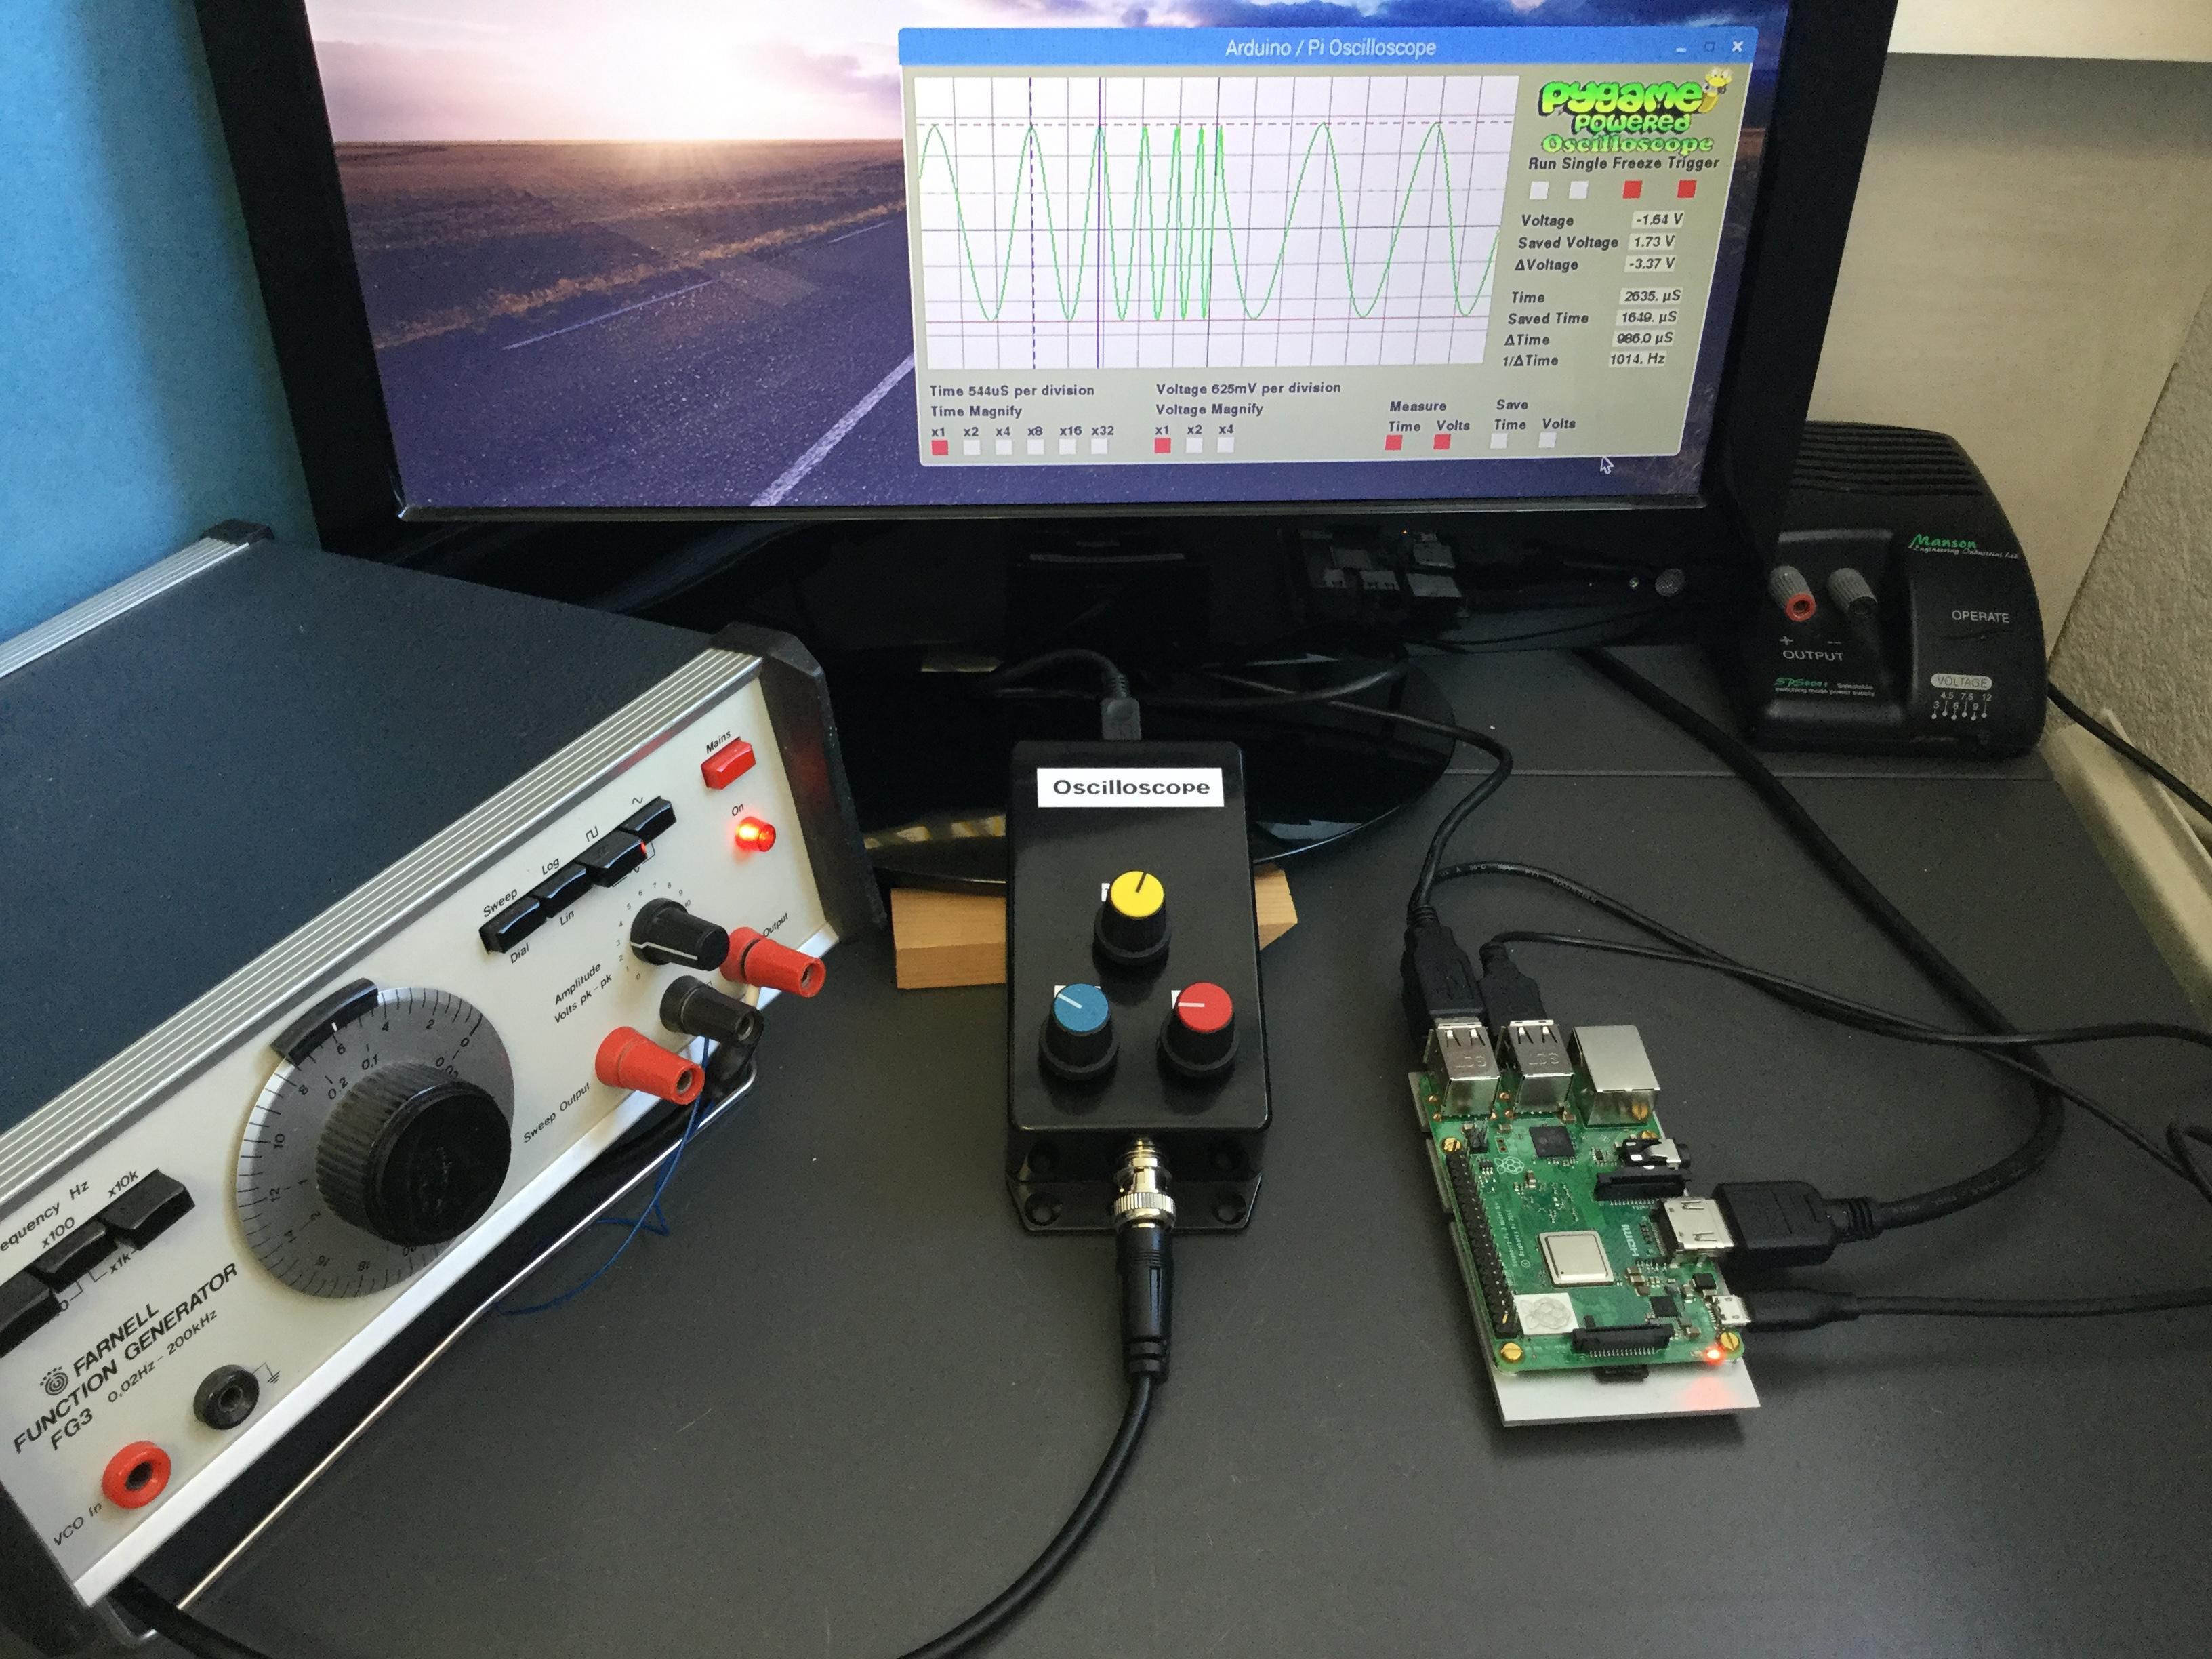 Build an oscilloscope using Raspberry Pi and Arduino